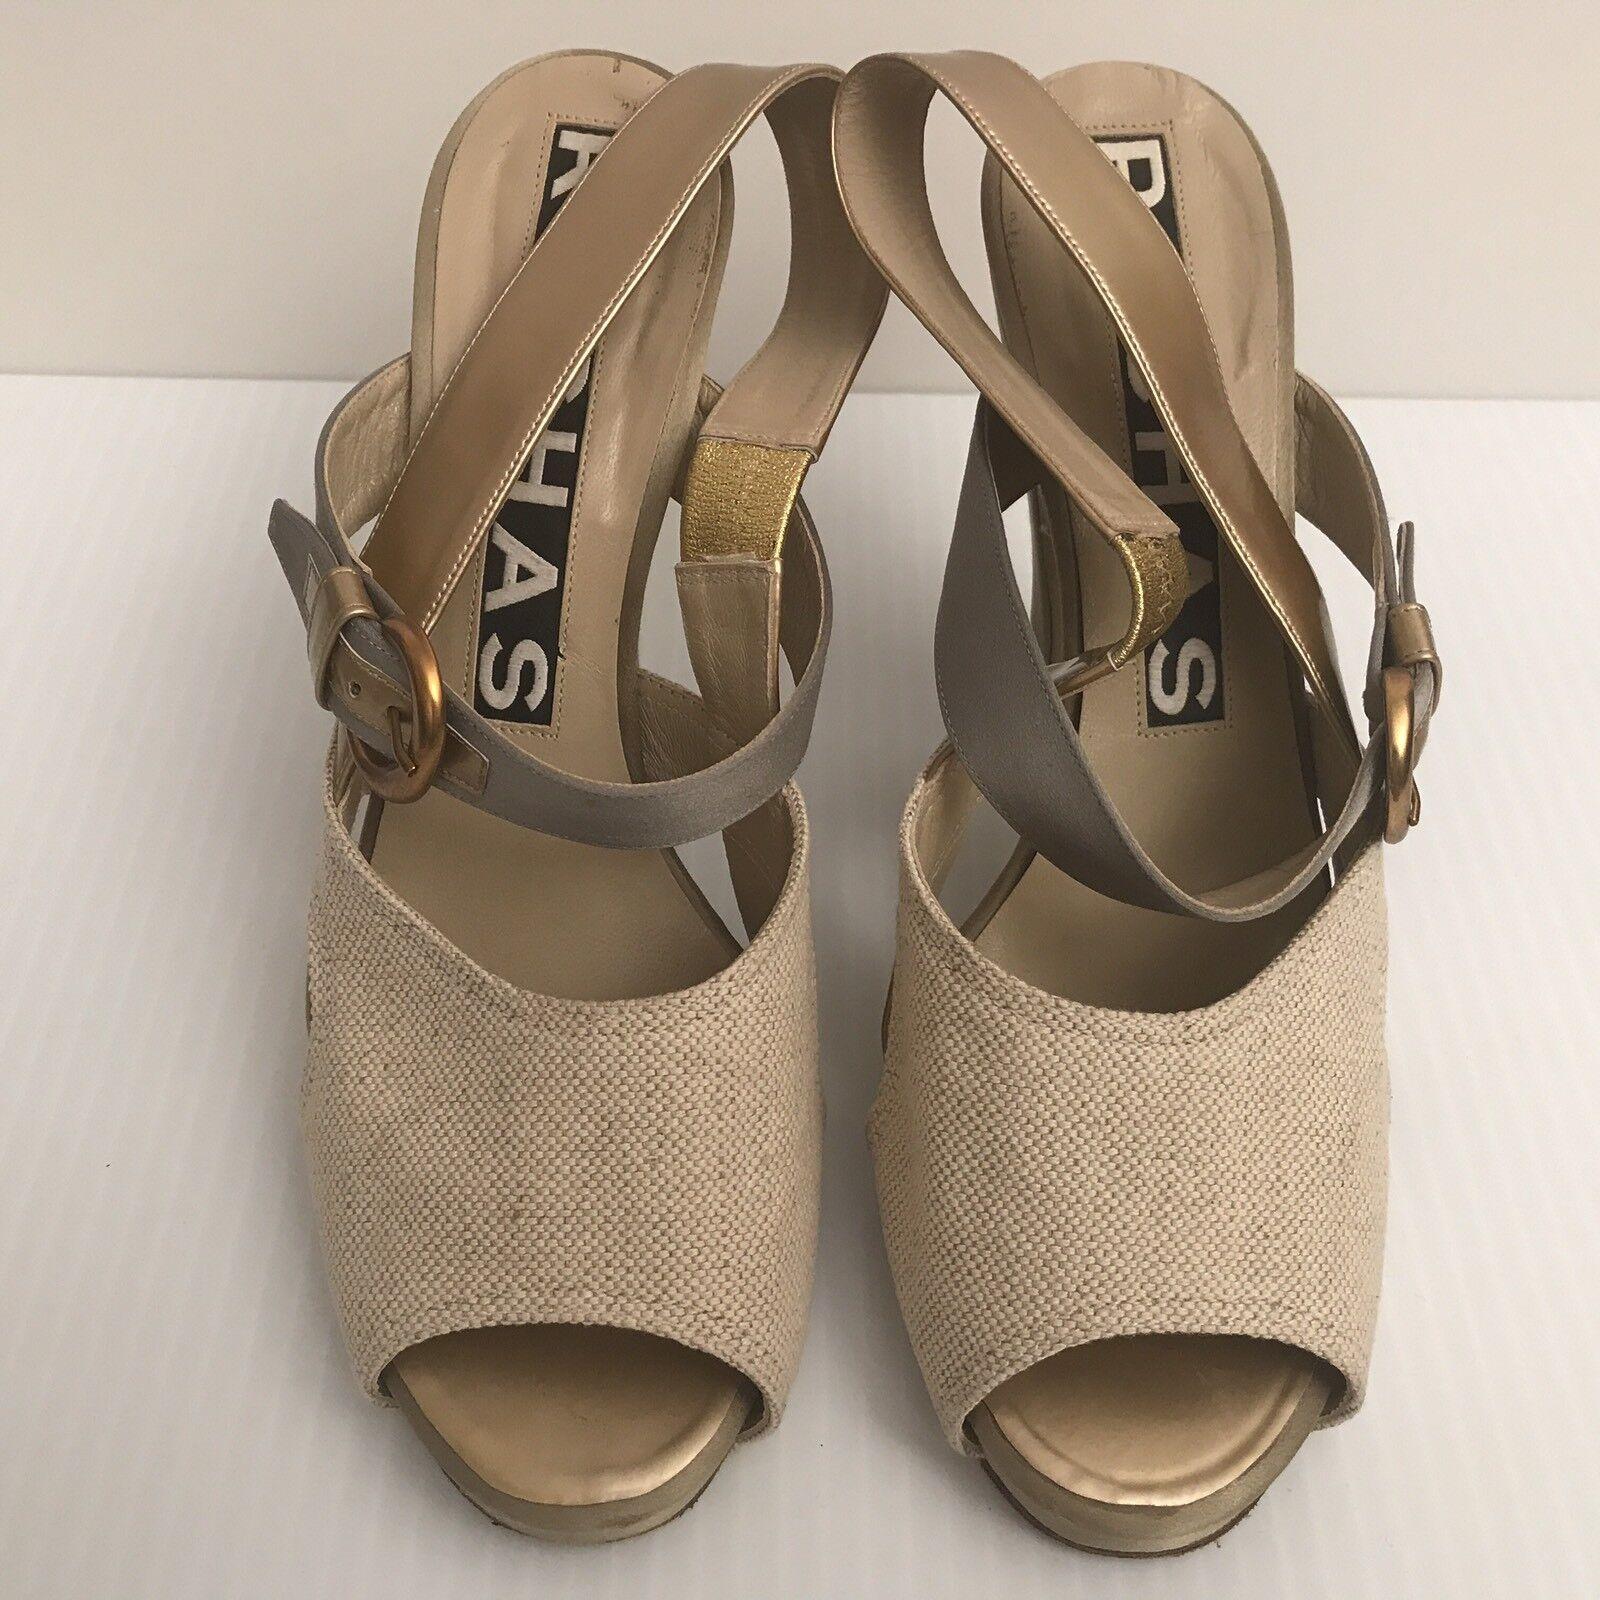 ROCHAS Peep-Toe Linen Leather Slingback Sandal shoes ITALY Size 40 Retail -  995